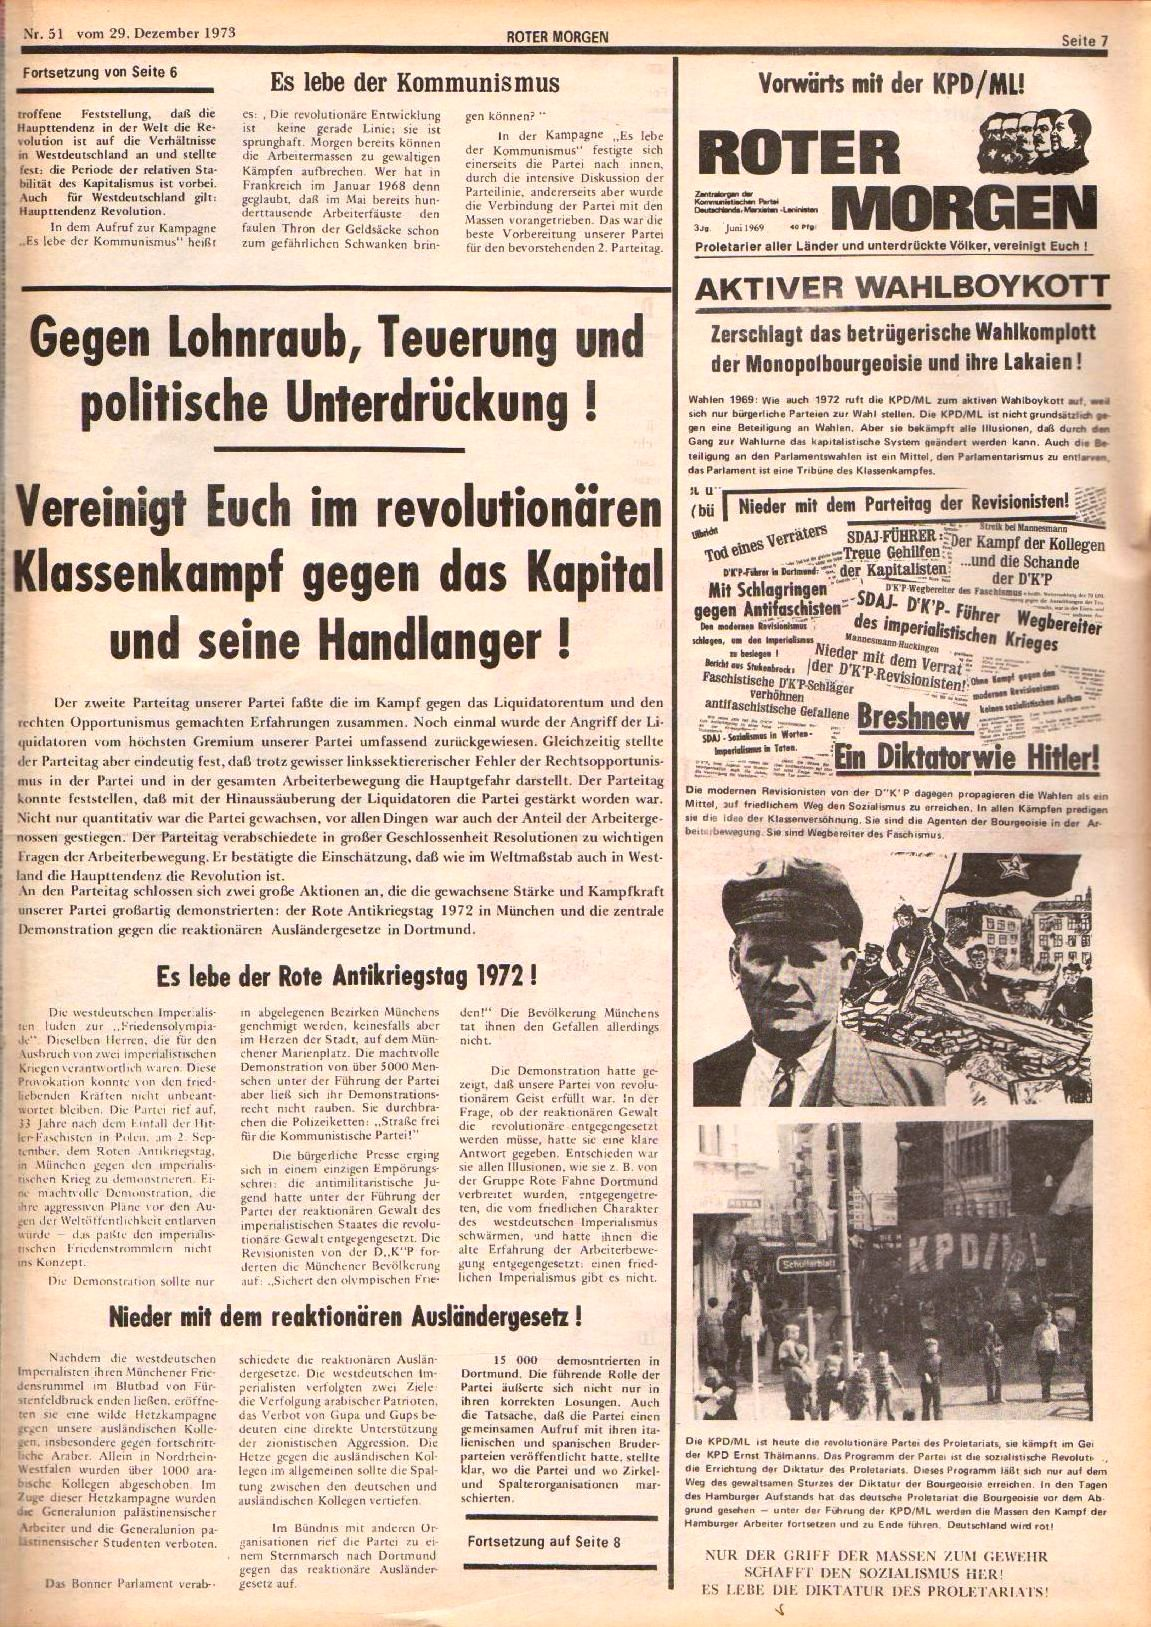 Roter Morgen, 7. Jg., 29. Dezember 1973, Nr. 51, Seite 7